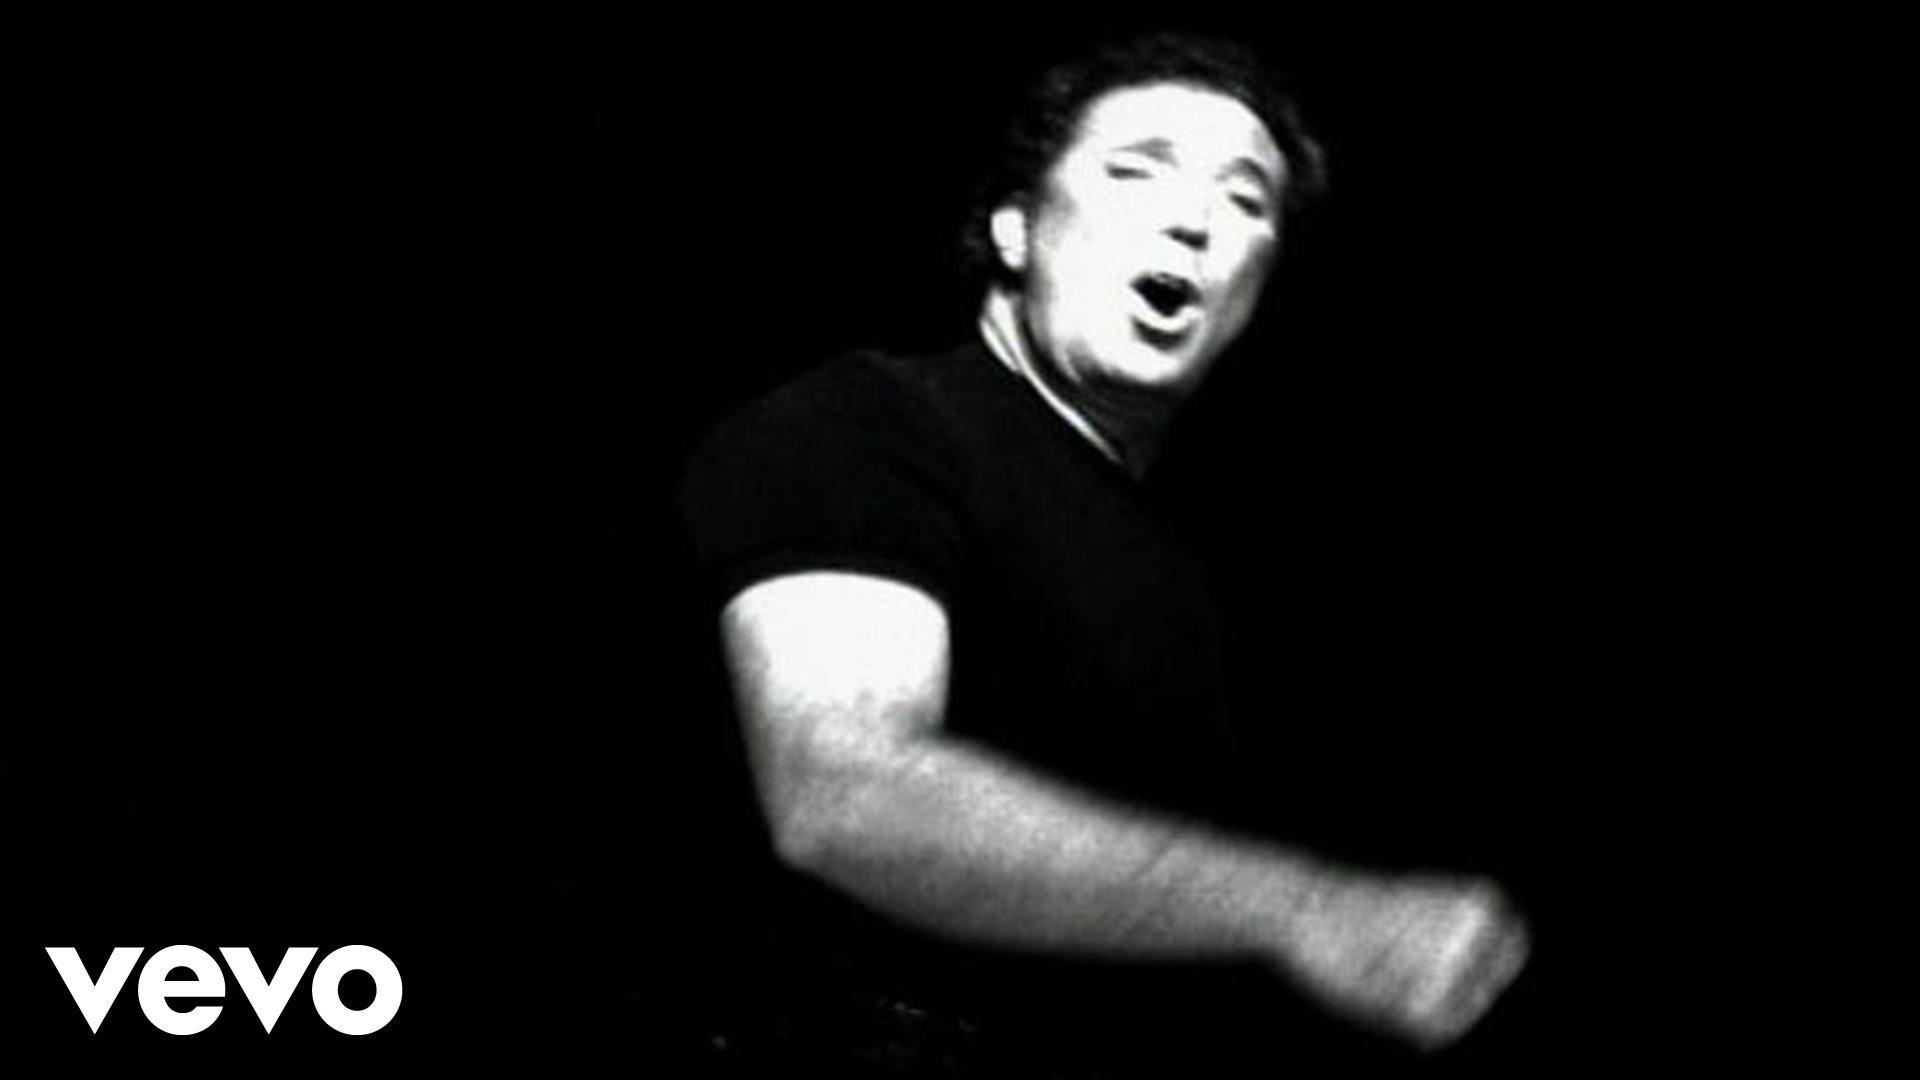 Tom Jones - If I Only Knew - YouTube